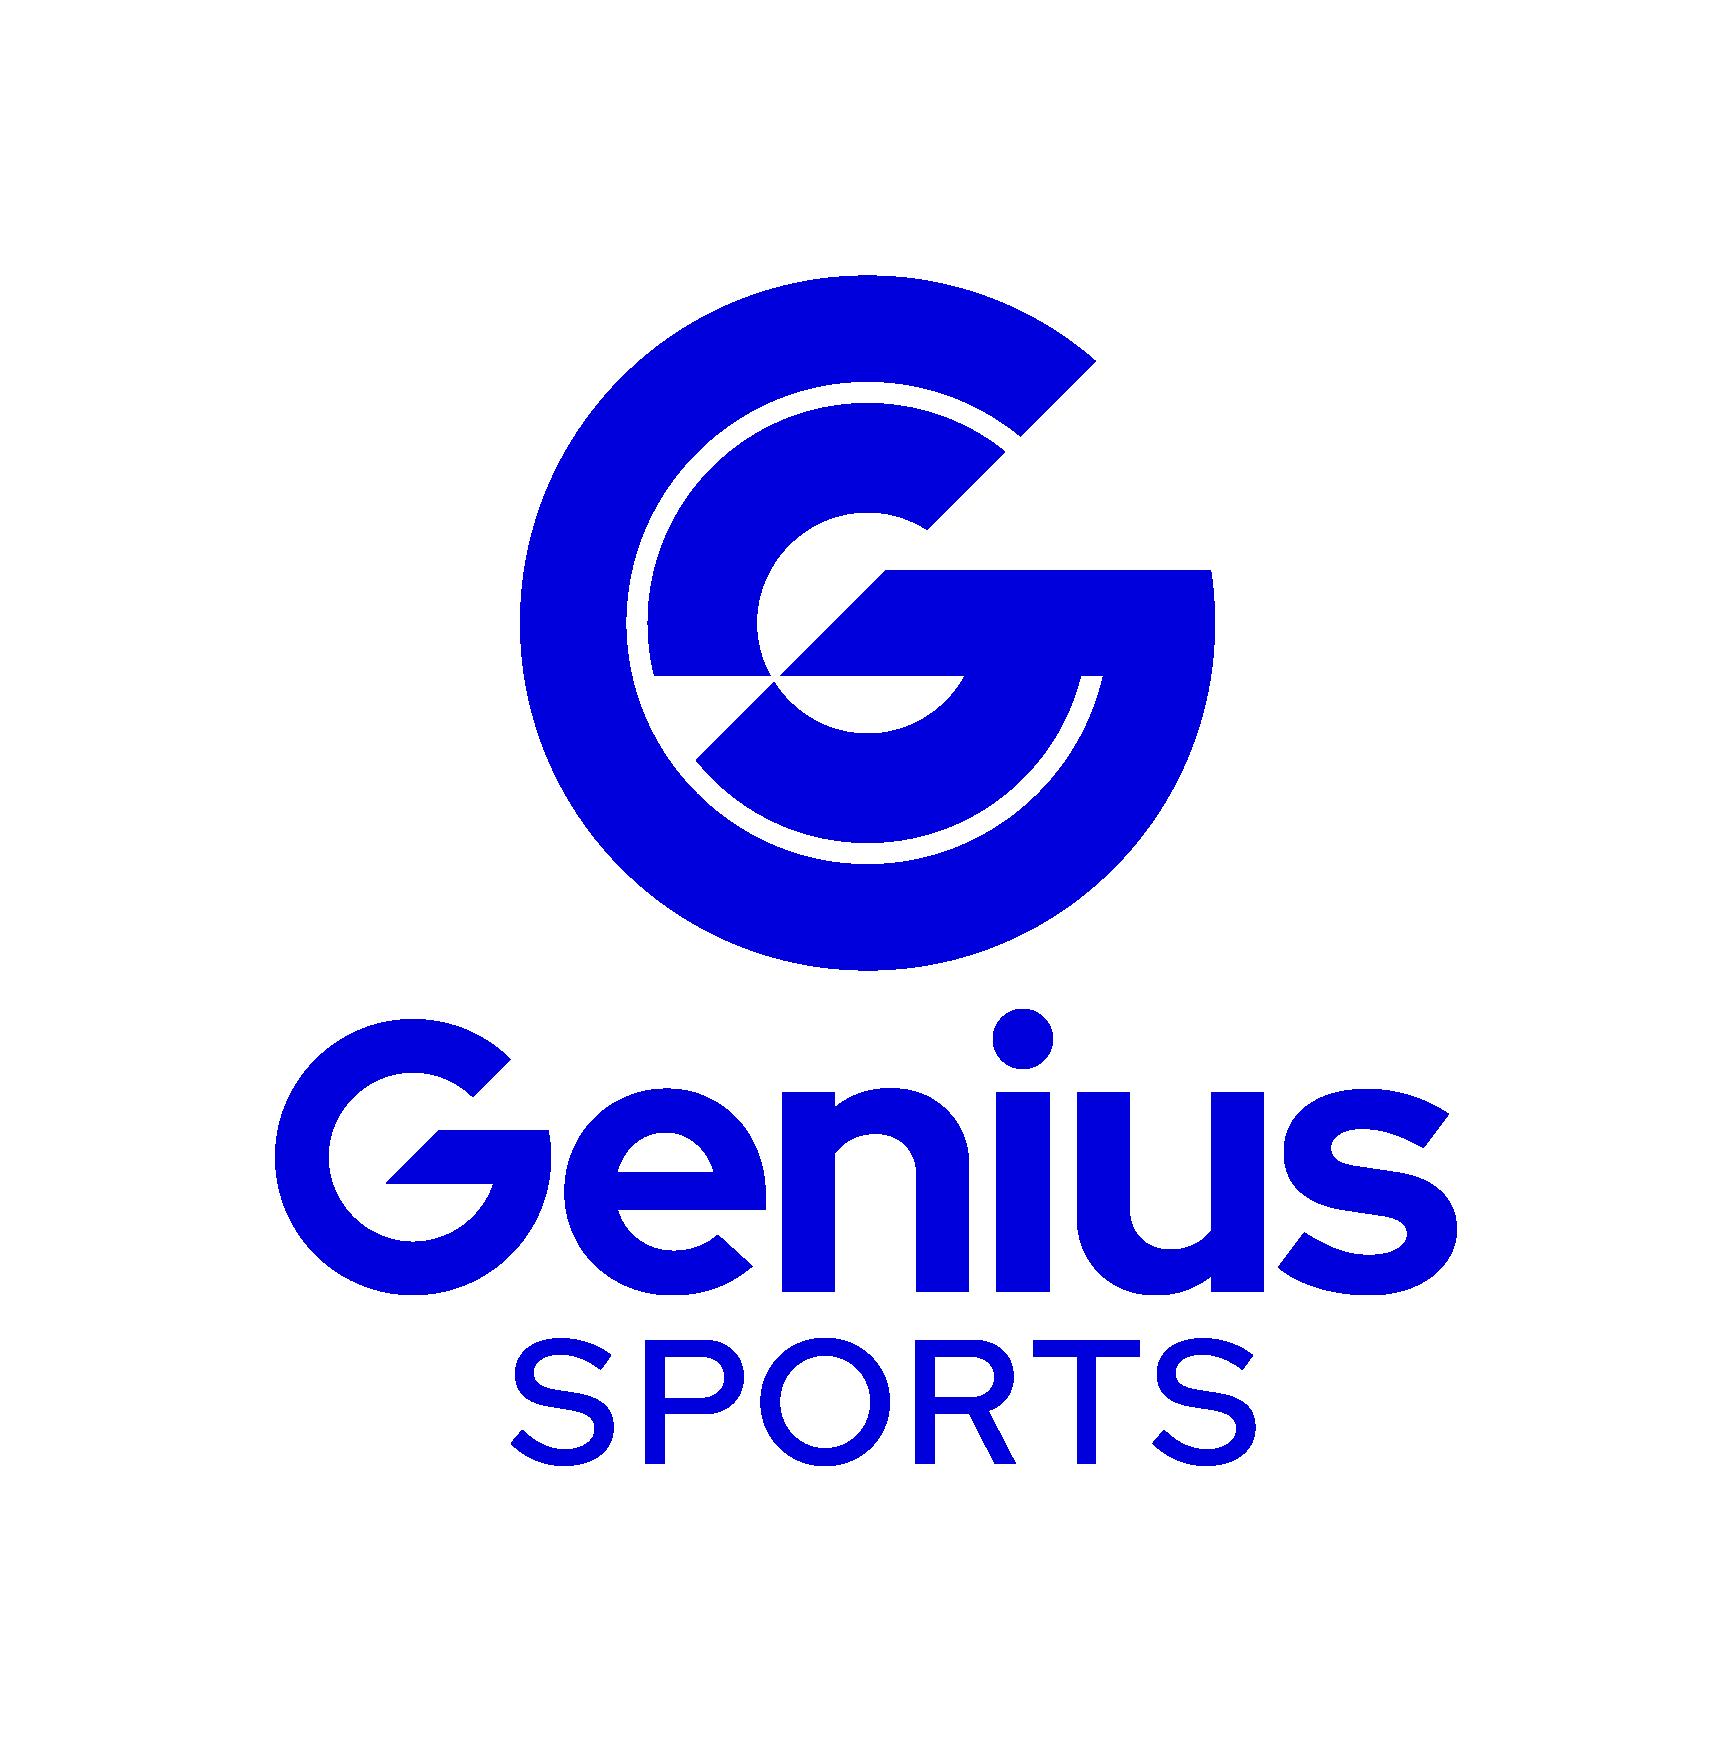 geniussports